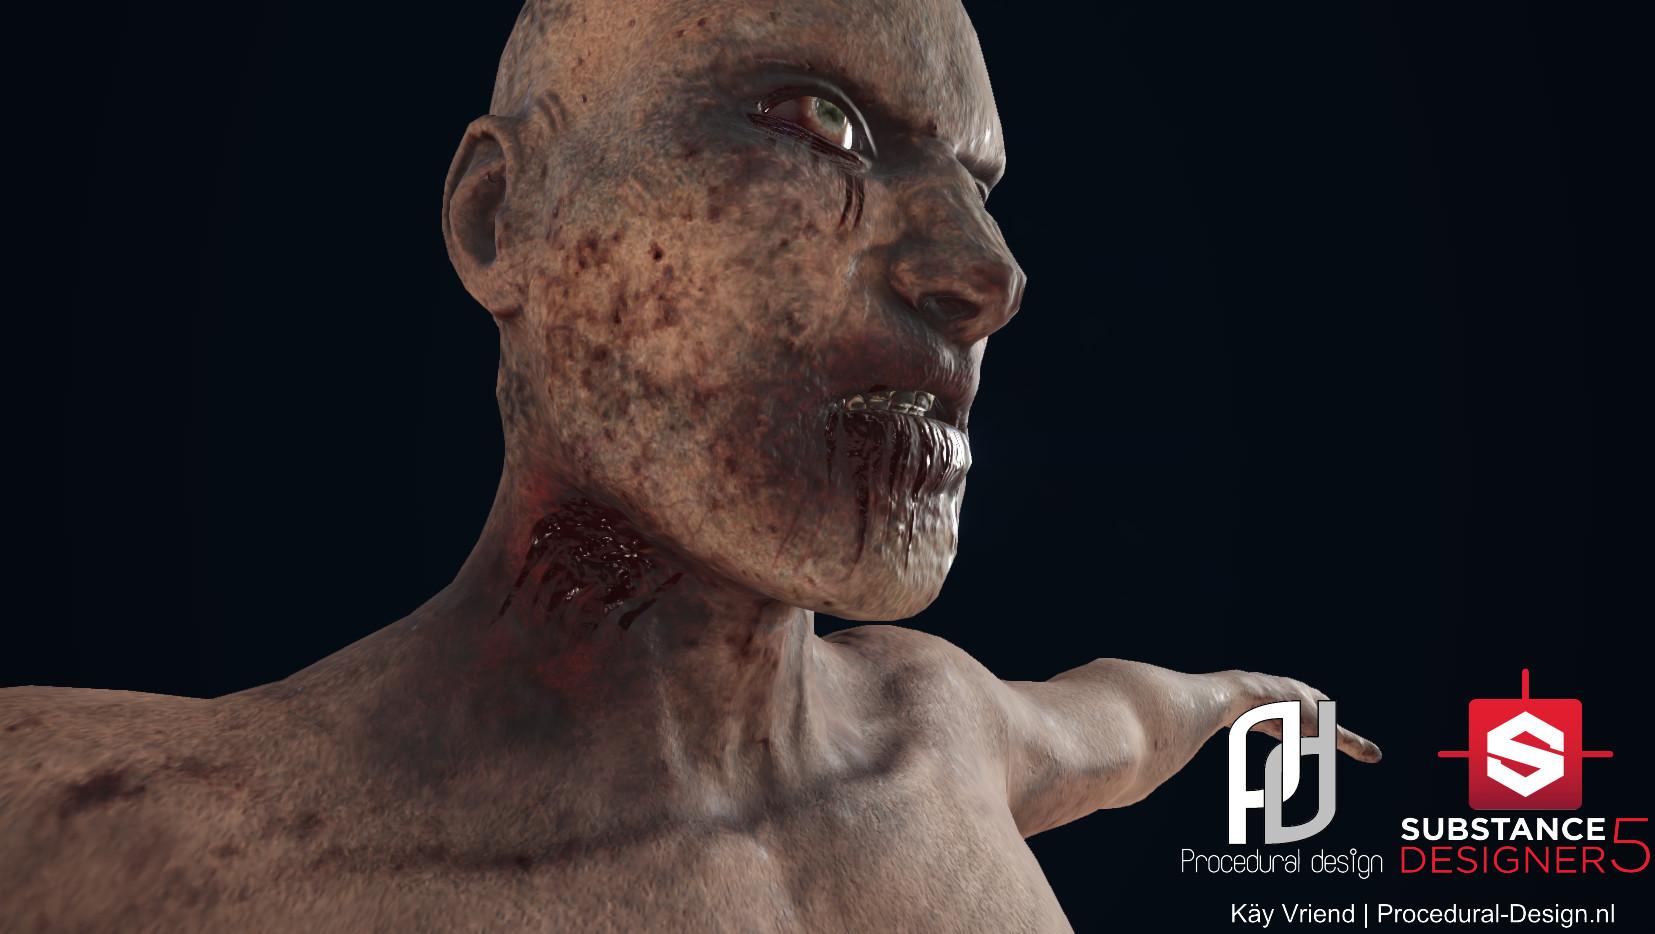 Kay vriend zombie 22